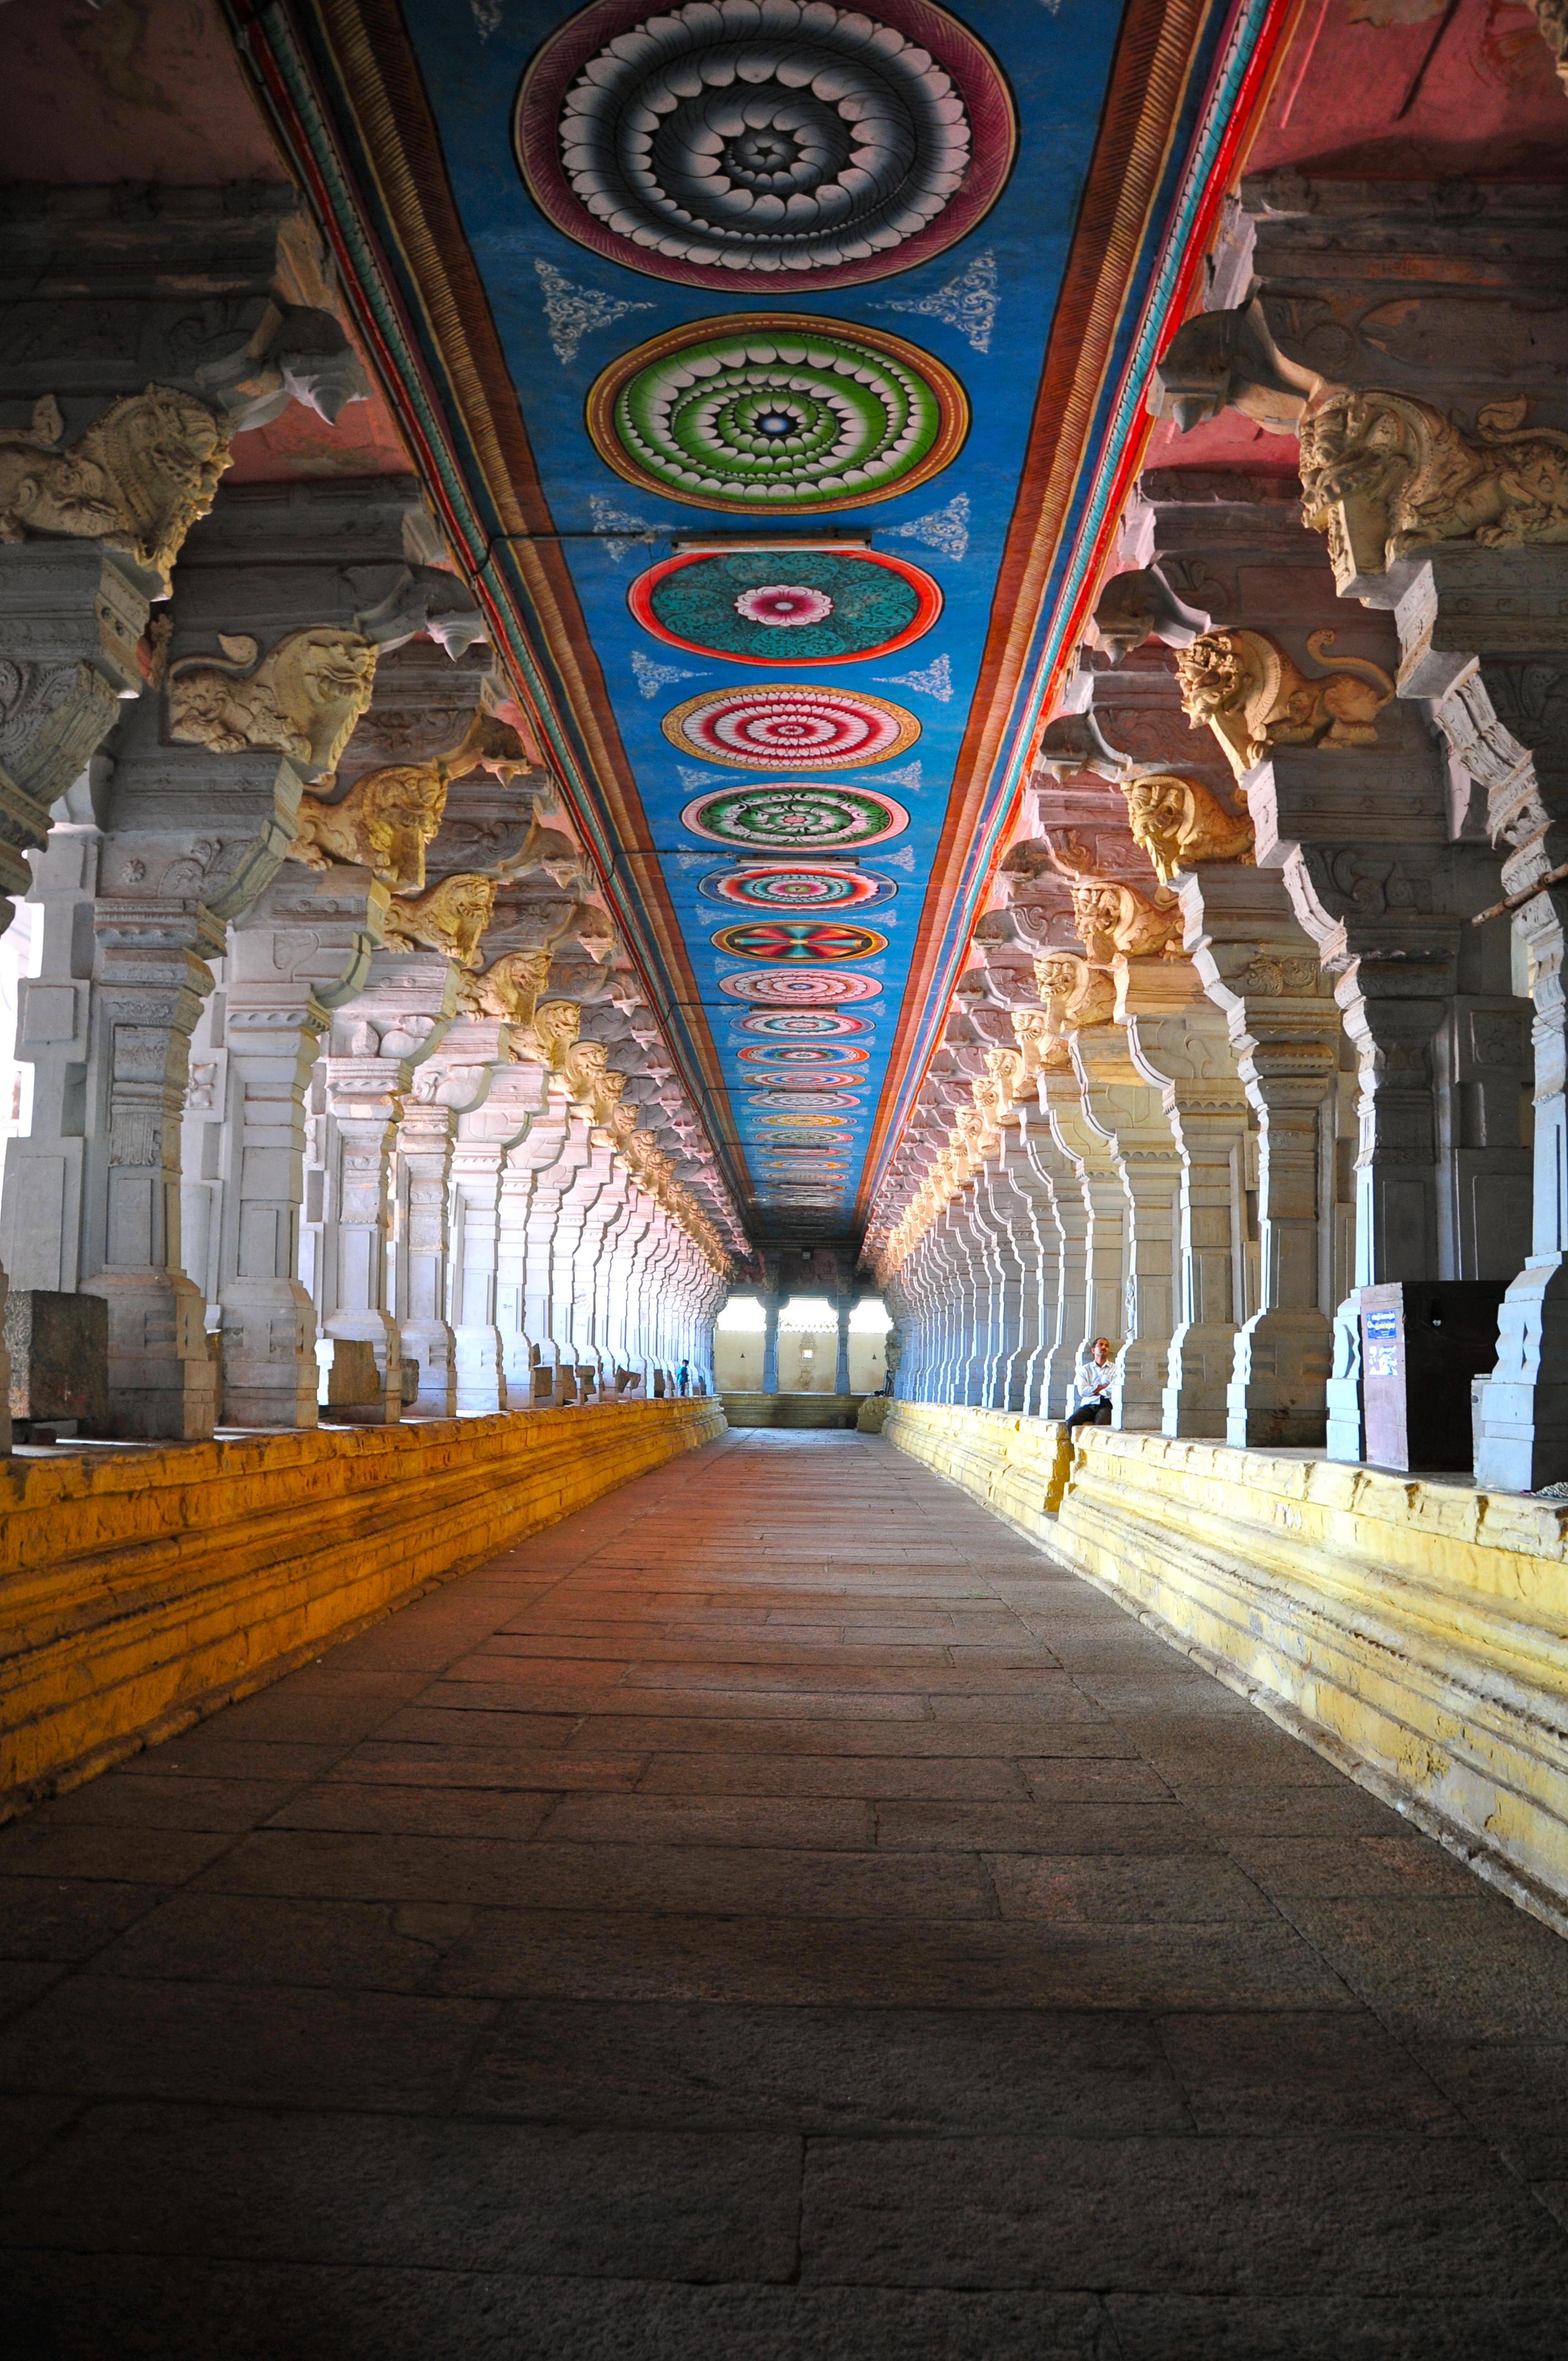 file:rameswaram temple corridor - wikimedia commons